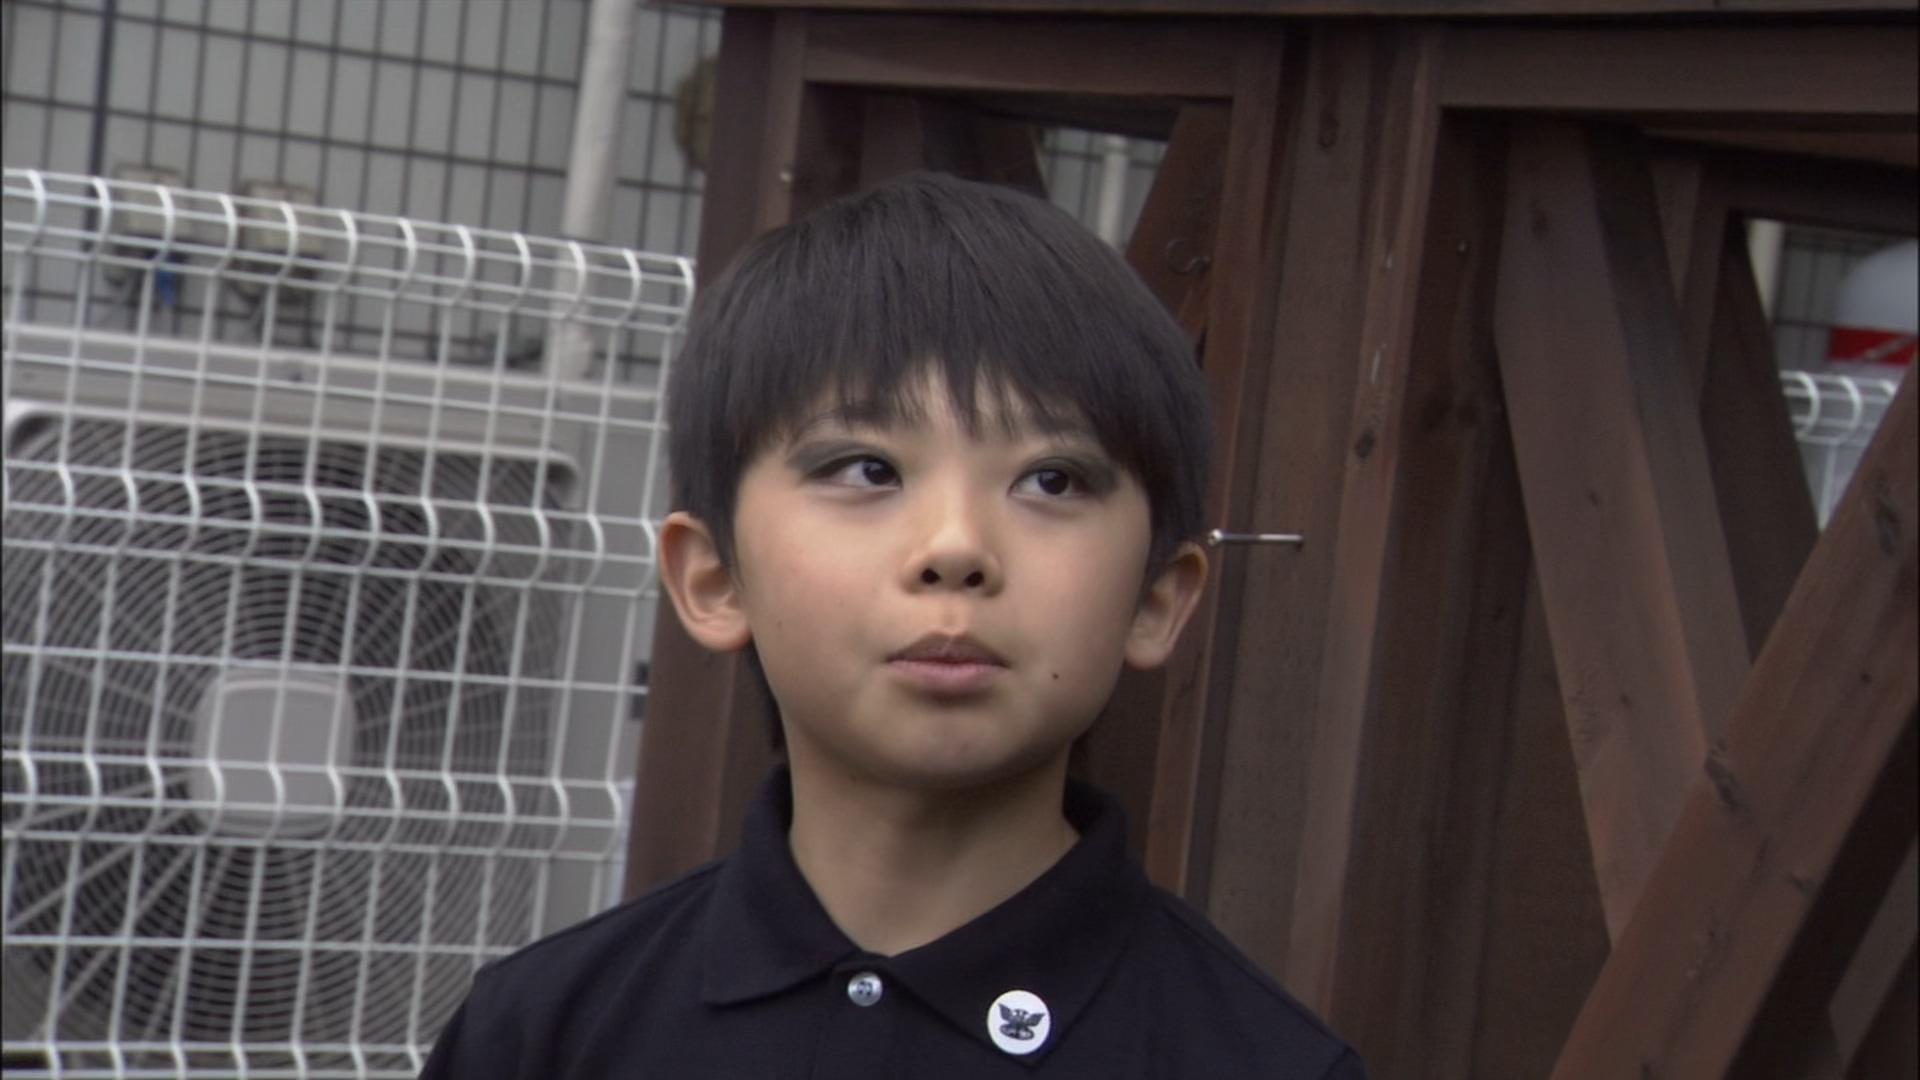 Masahiko Okamura